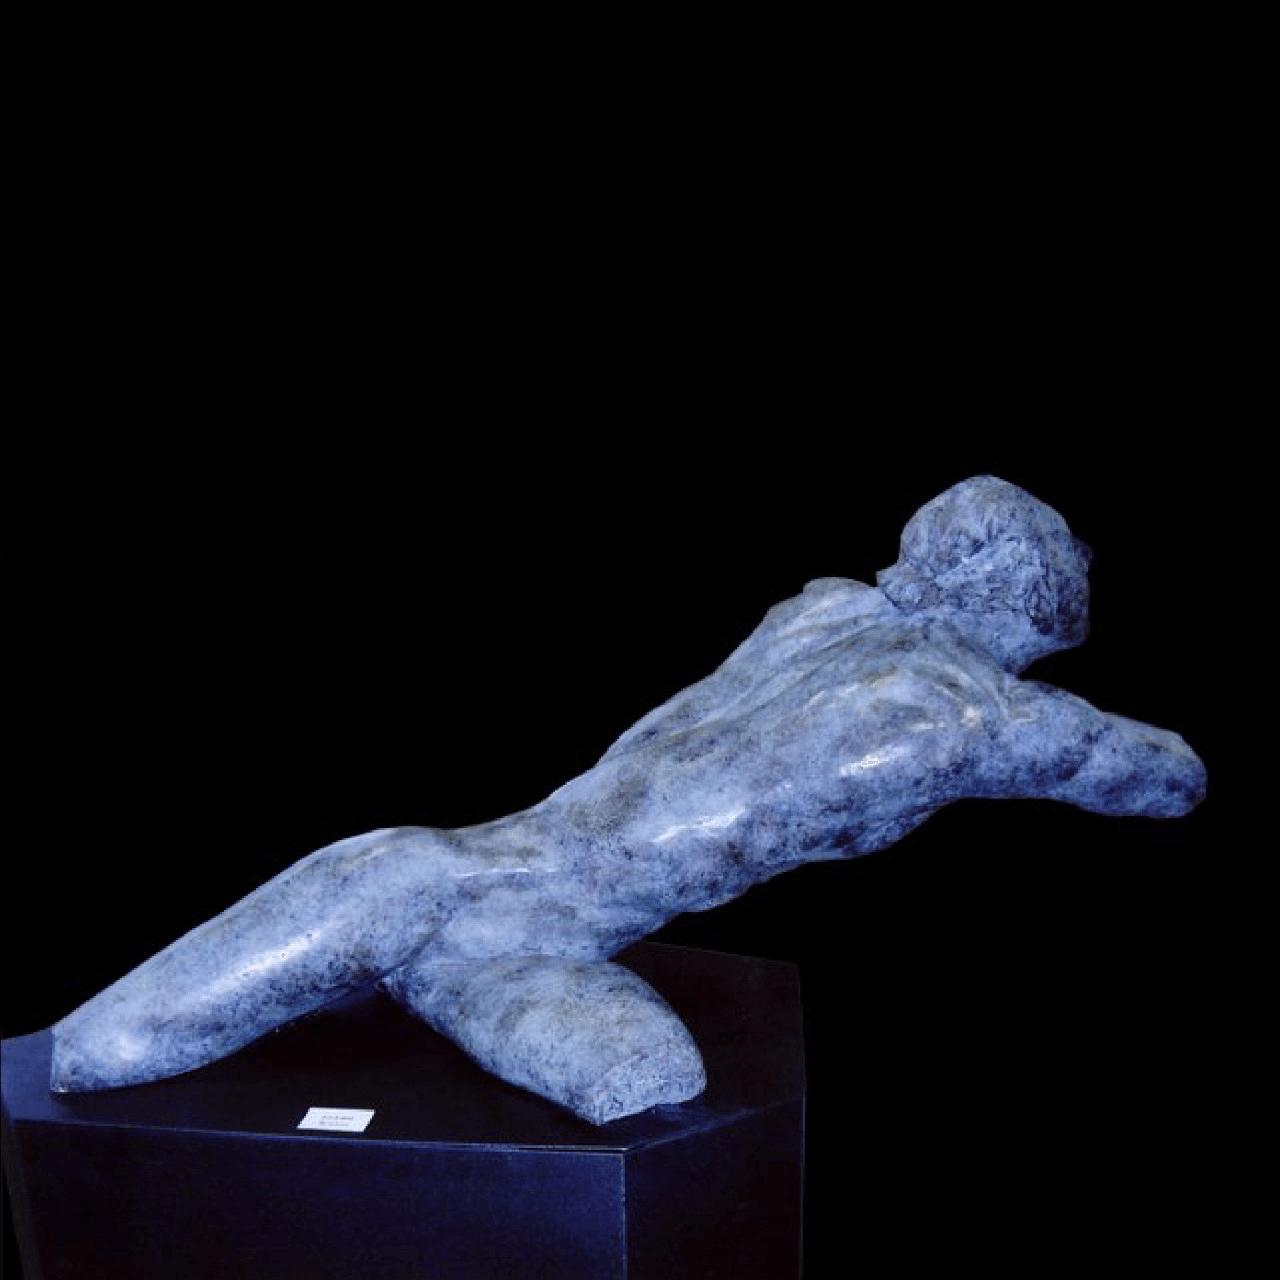 mario pavesi italian sculptur painter male body